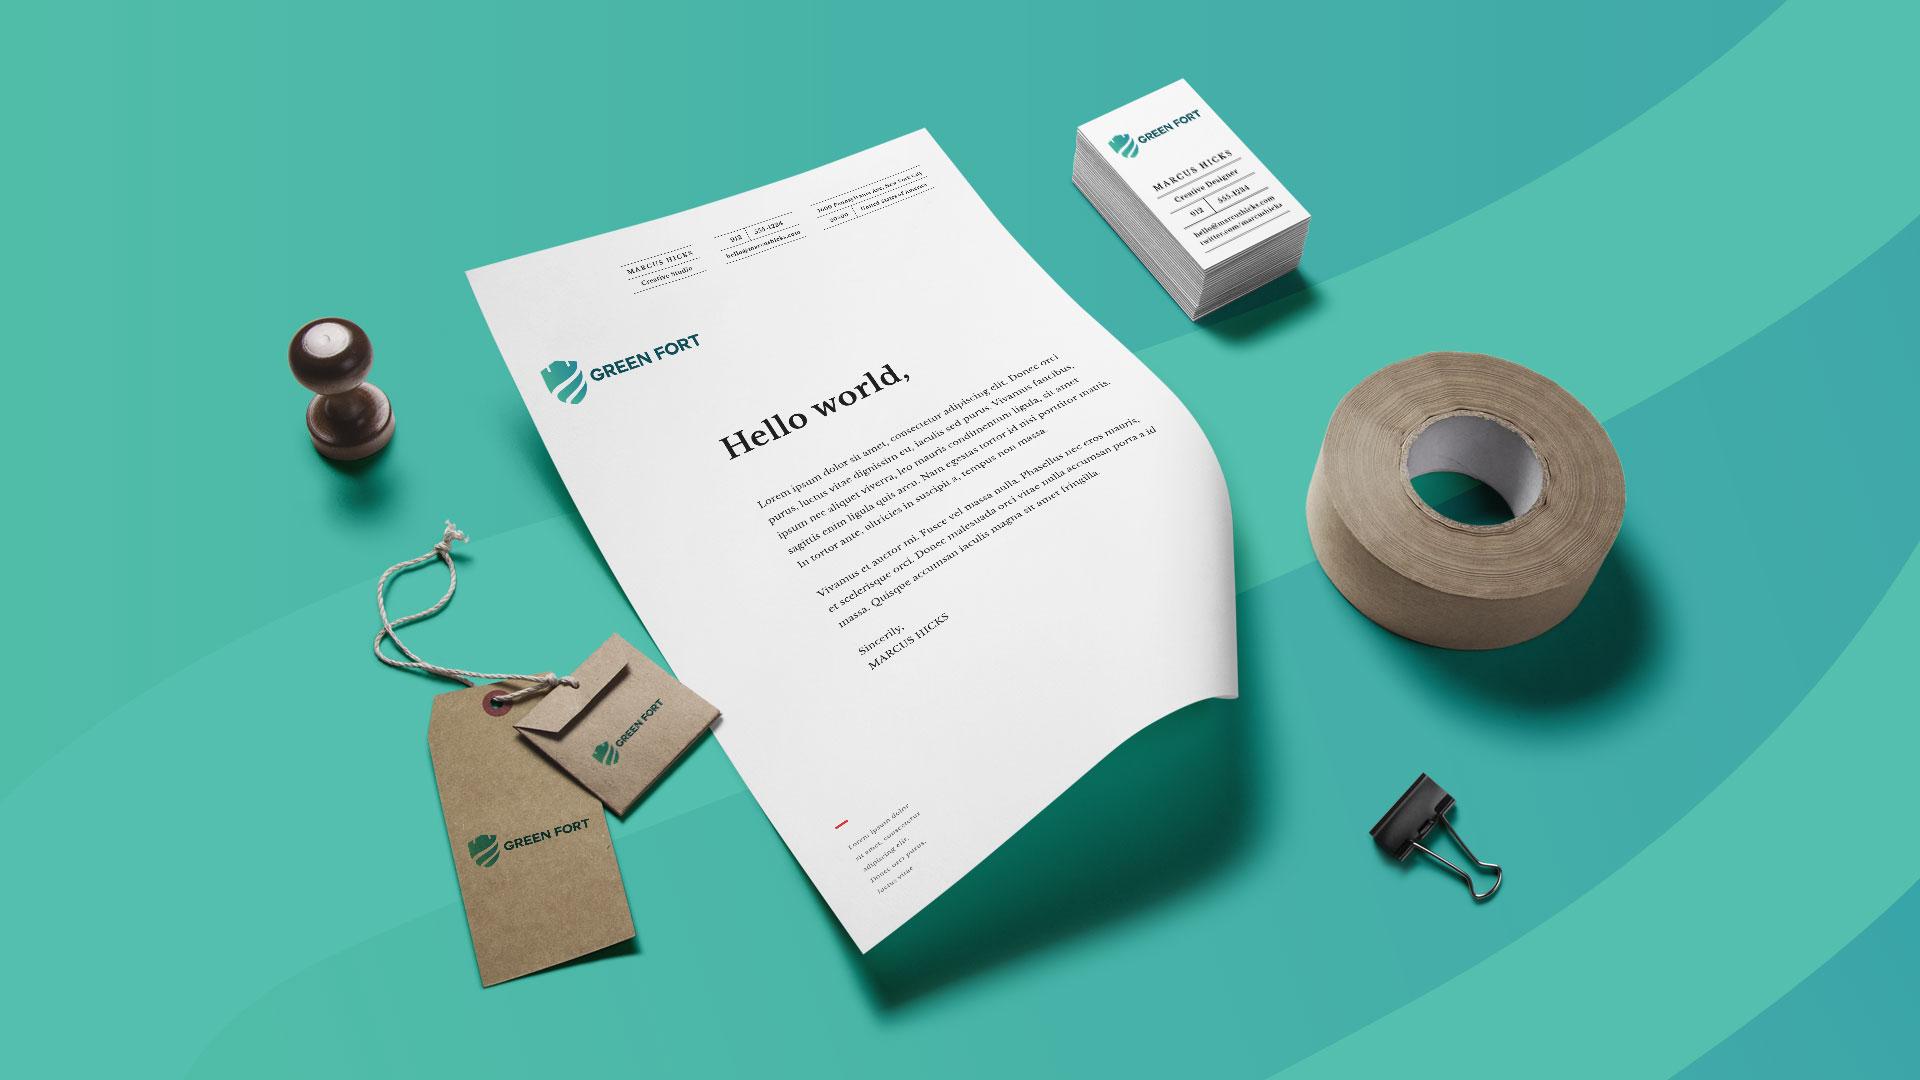 Green Fort Saudi Arabia Company Branding Design